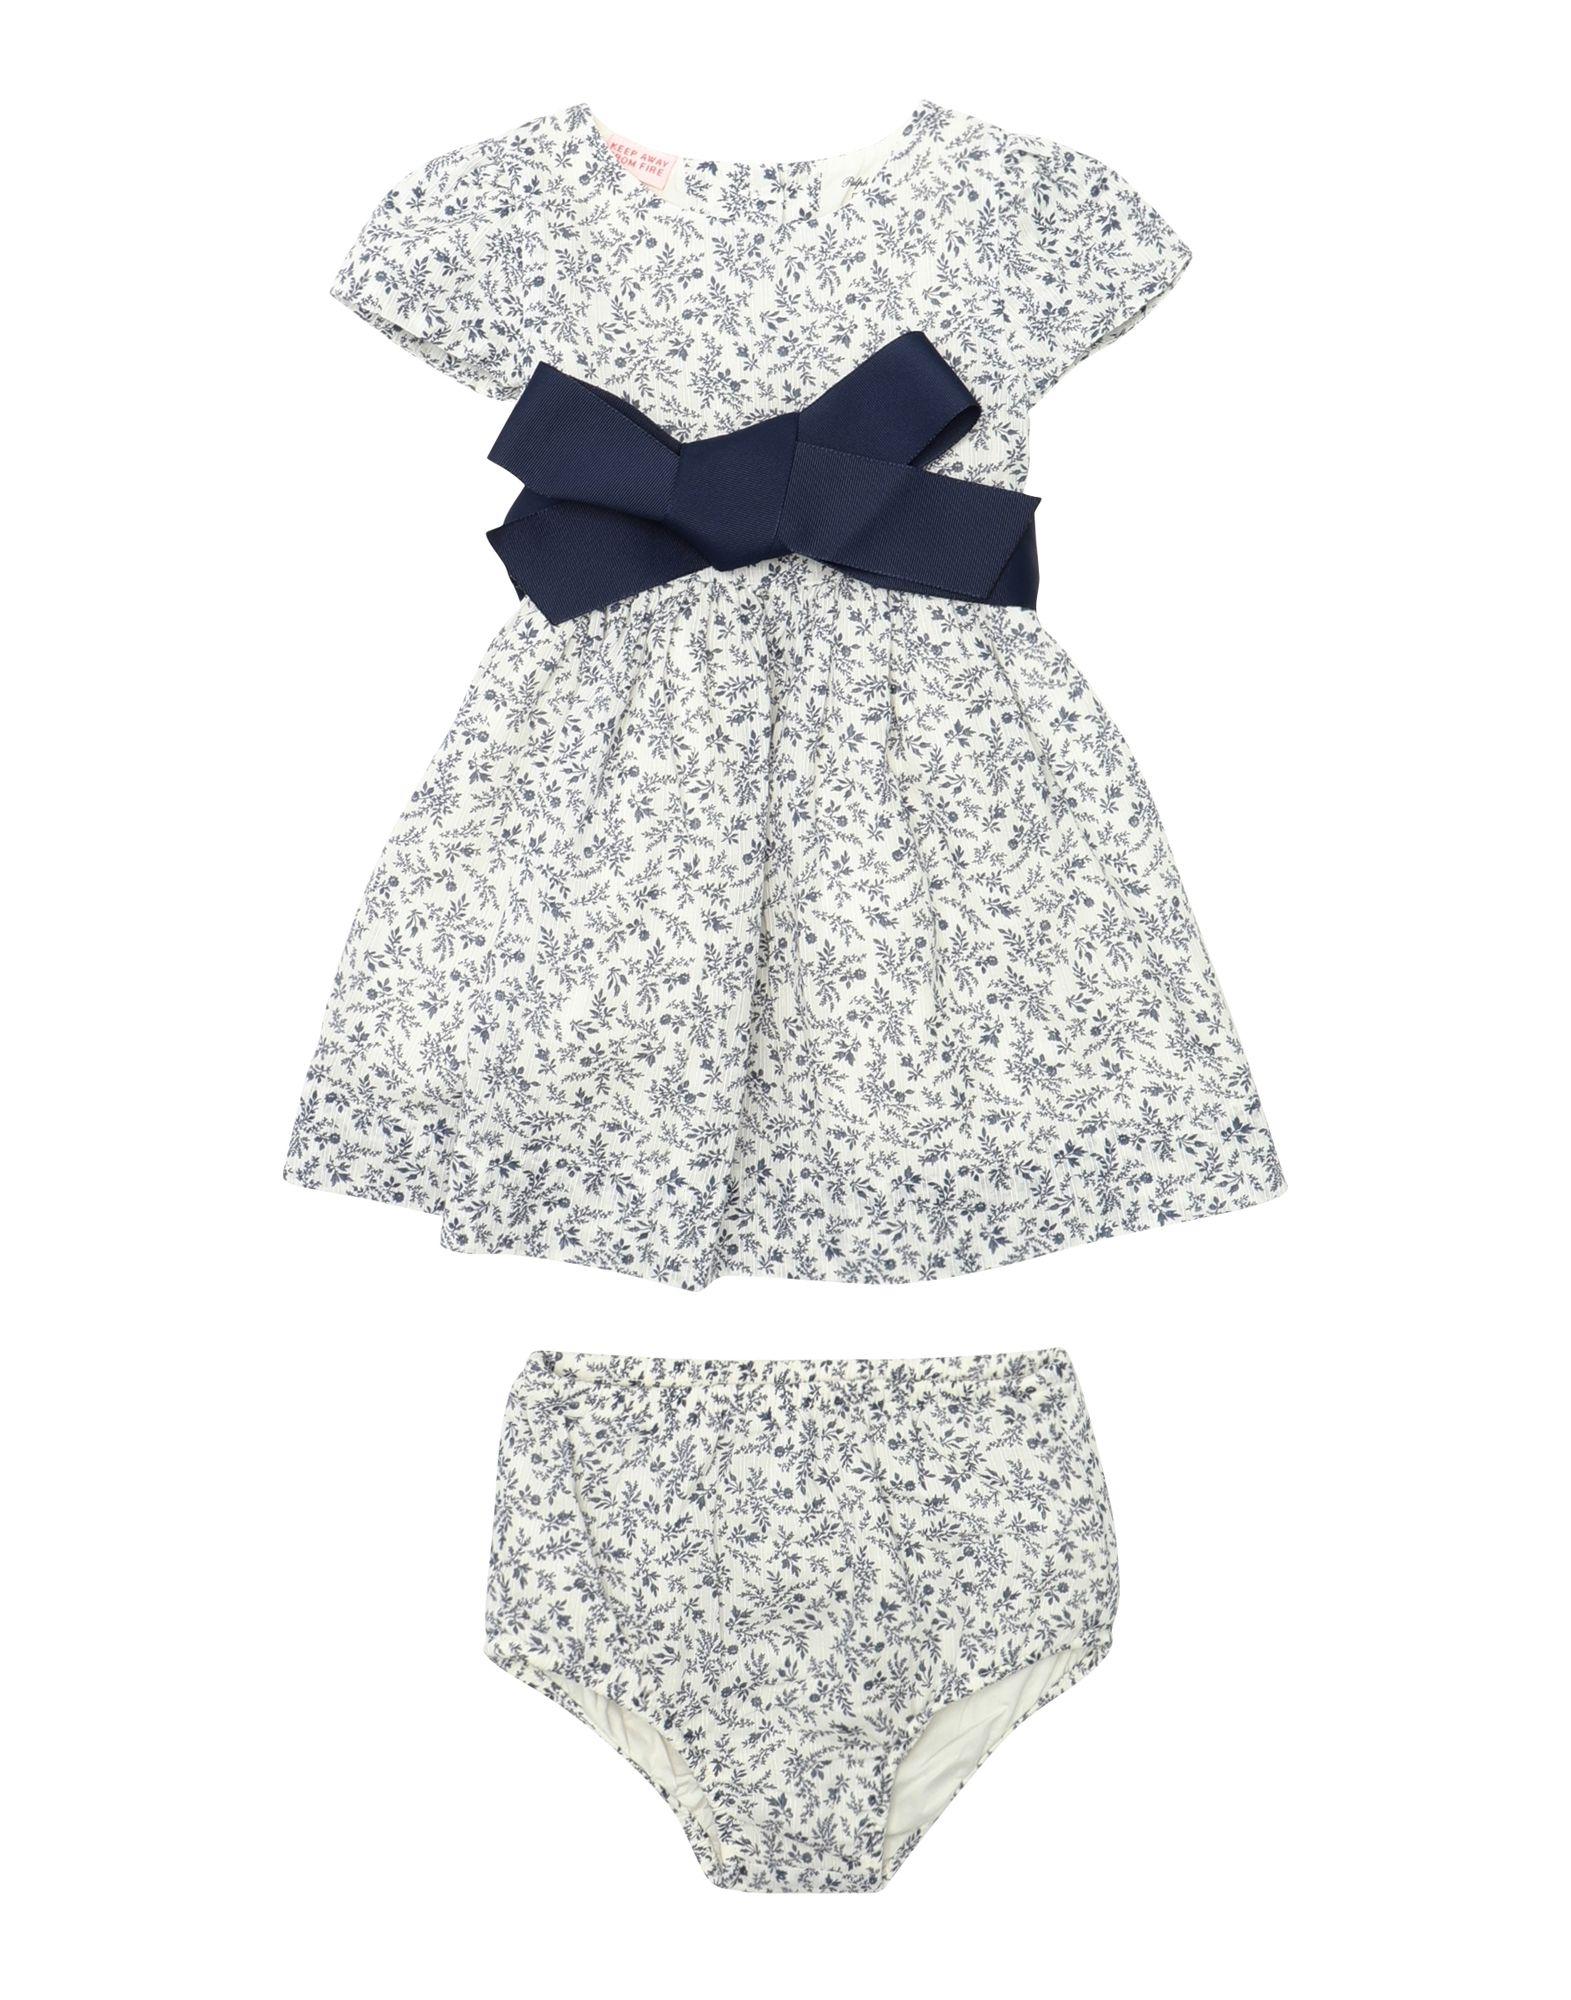 a24675402b8 Φορμάκια Κορμάκια Kορίτσι Ralph Lauren 0-24 μηνών - Παιδικά ρούχα στο YOOX